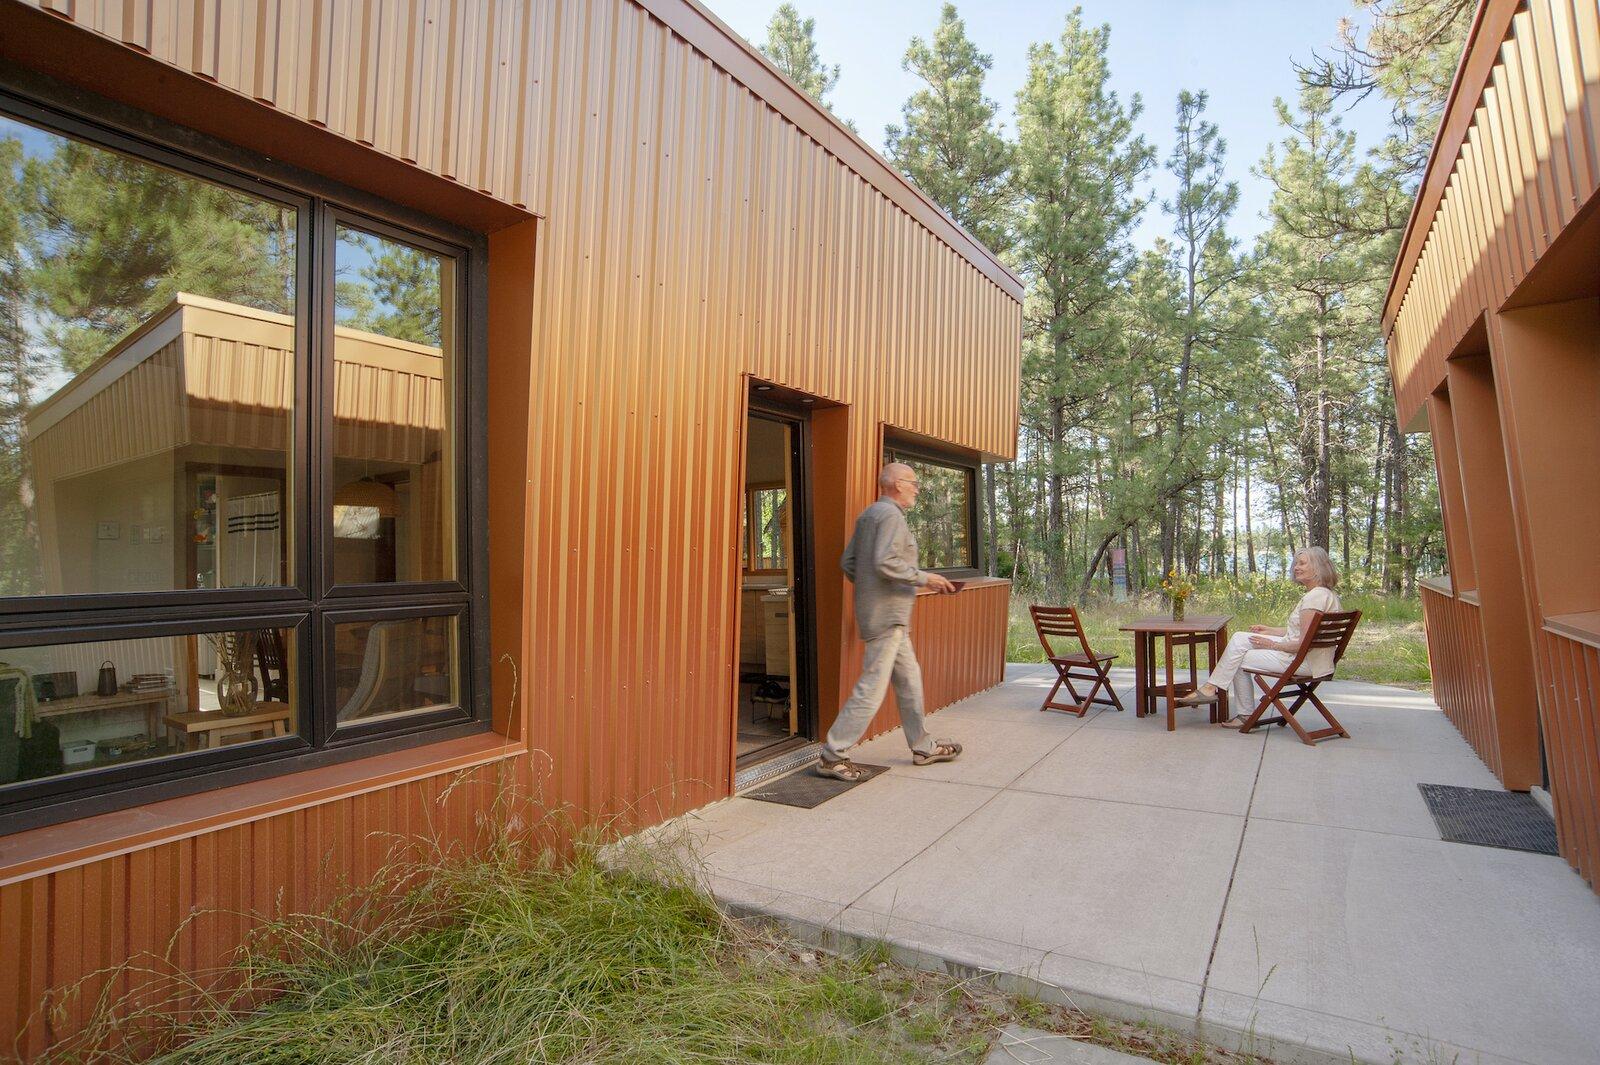 Courtyard of Treegazer cabin.